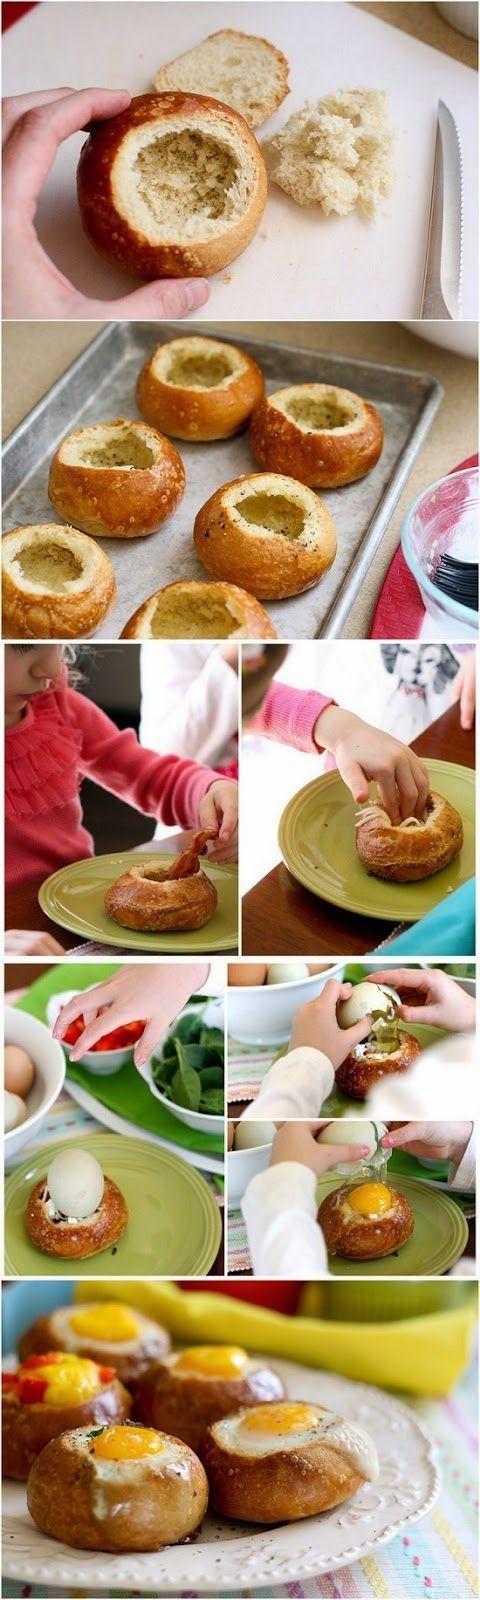 Fill the muffin baked with an egg Panecillo al horno relleno con un huevo Subido de Pinterest. http://www.isladelecturas.es/index.php/noticias/libros/835-las-aventuras-de-indiana-juana-de-jaime-fuster A la venta en AMAZON. Feliz lectura.